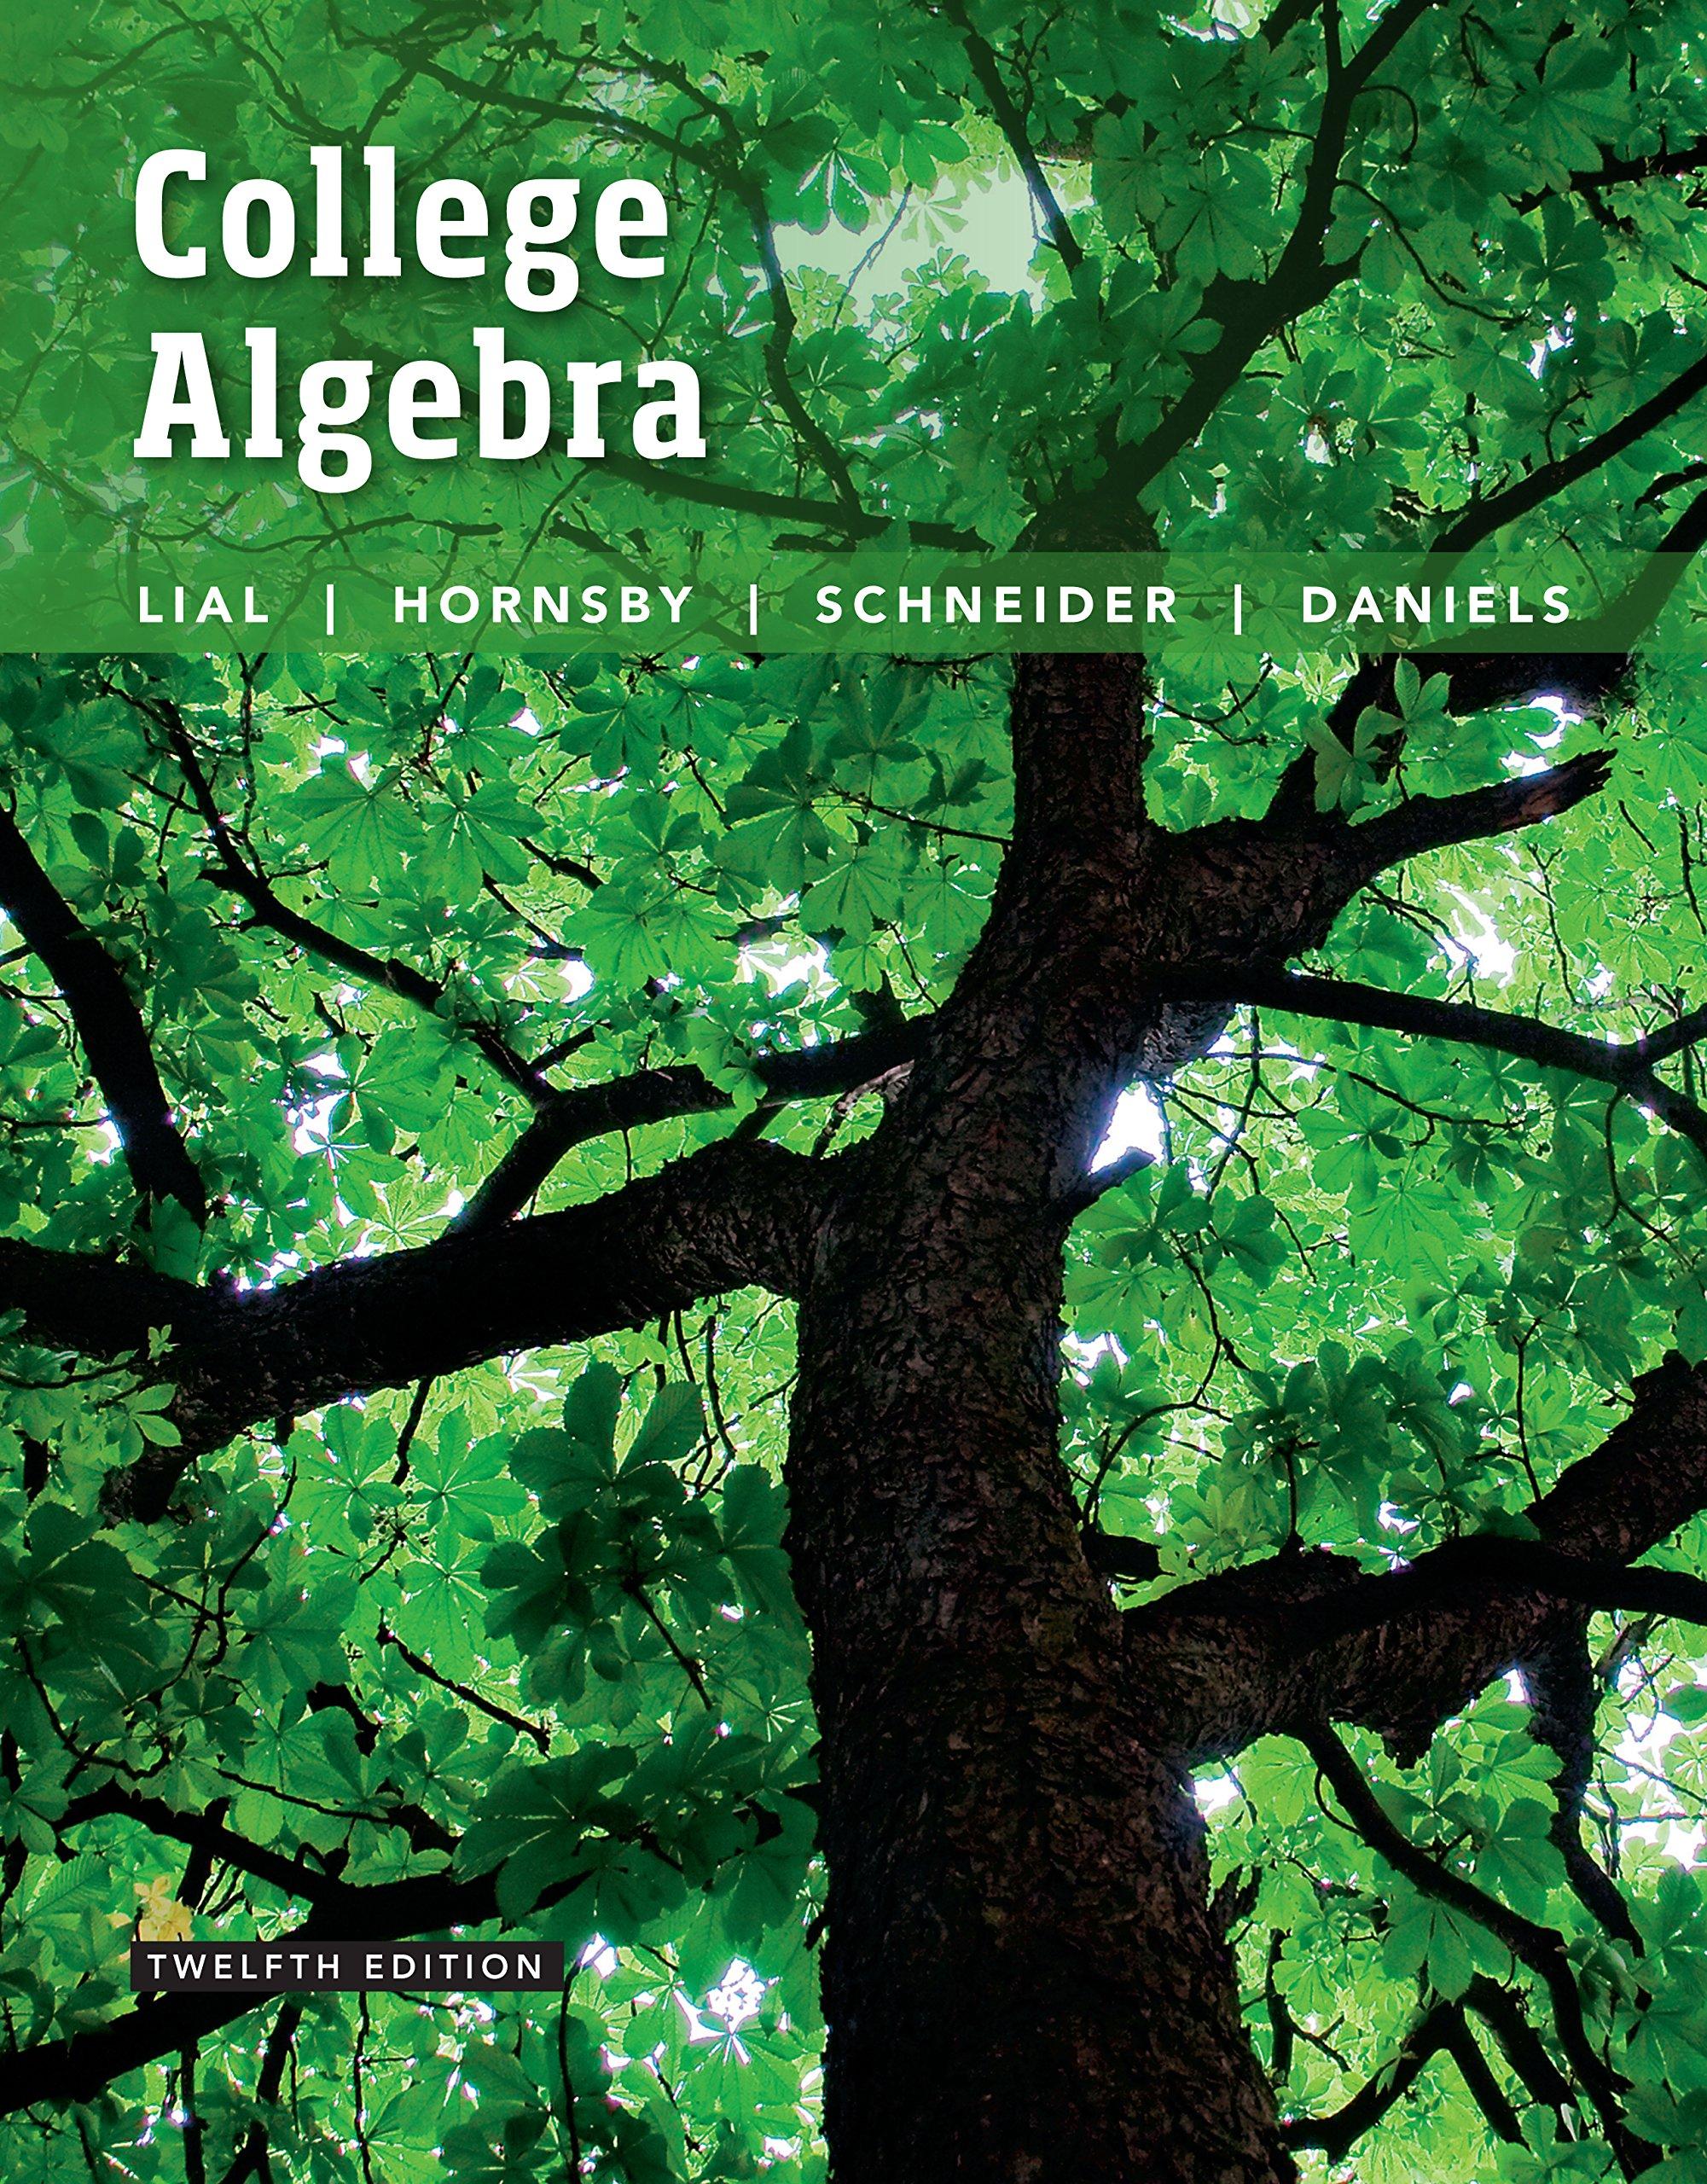 College Algebra 12th Edition Pdf Free Download